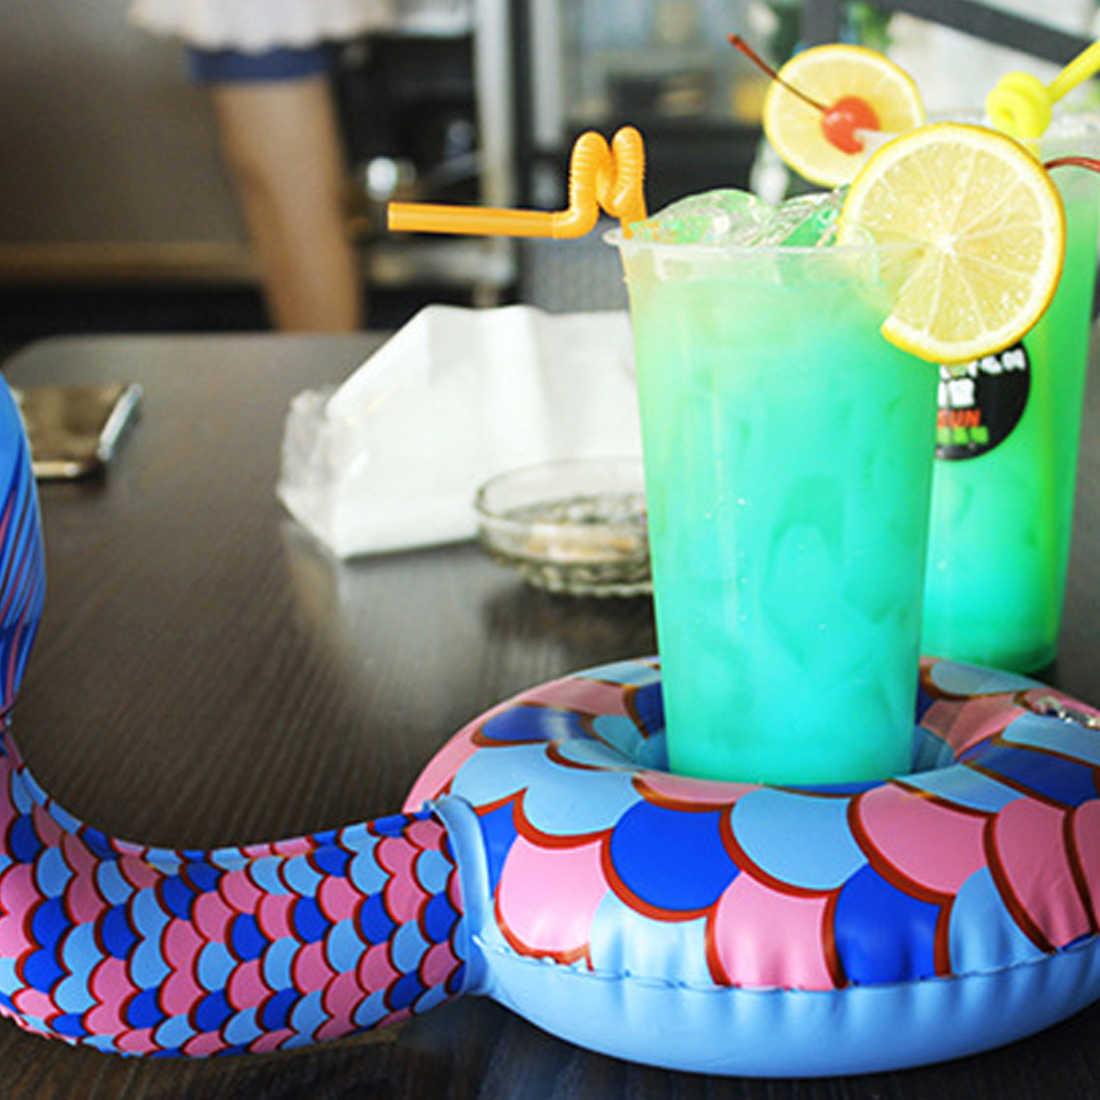 Seksi Baru Dapat Diisi Angin Zwembad Meja Bar Baki Kolam Renang Mengapung Cangkir Minuman Bir Penahan Kolam Renang Musim Panas Mainan Aksesoris Pantai